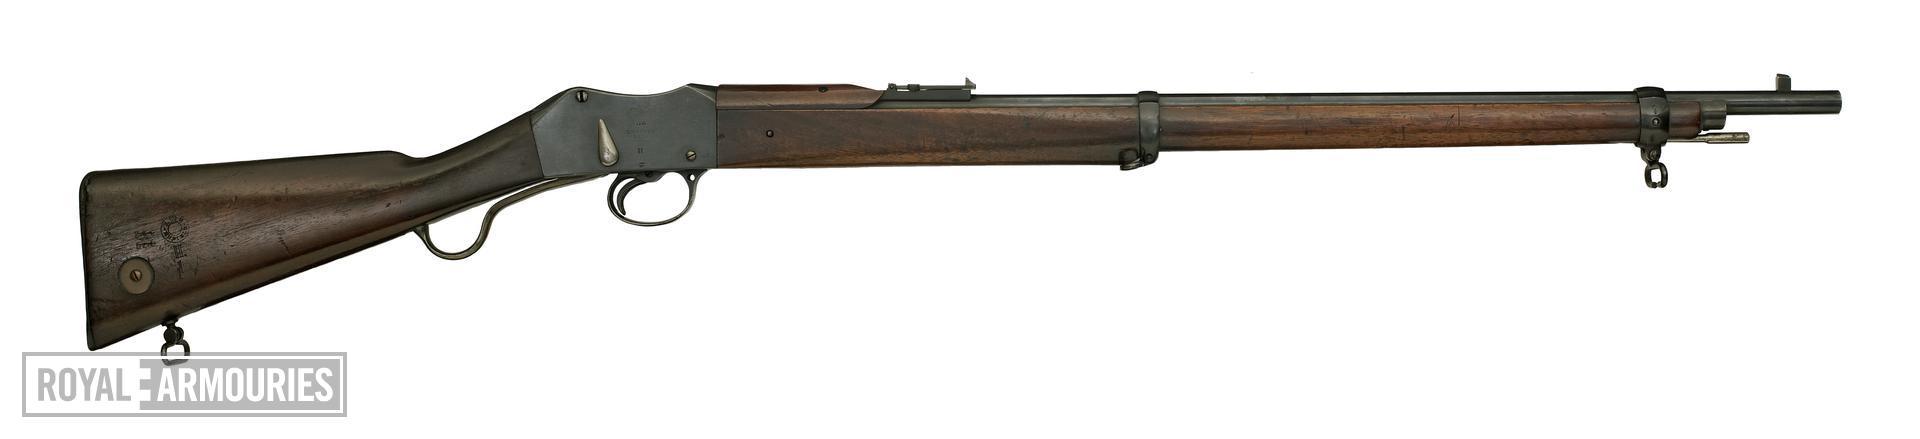 Centrefire breech-loading rifle - Martini-Enfield Mk.II, sealed pattern